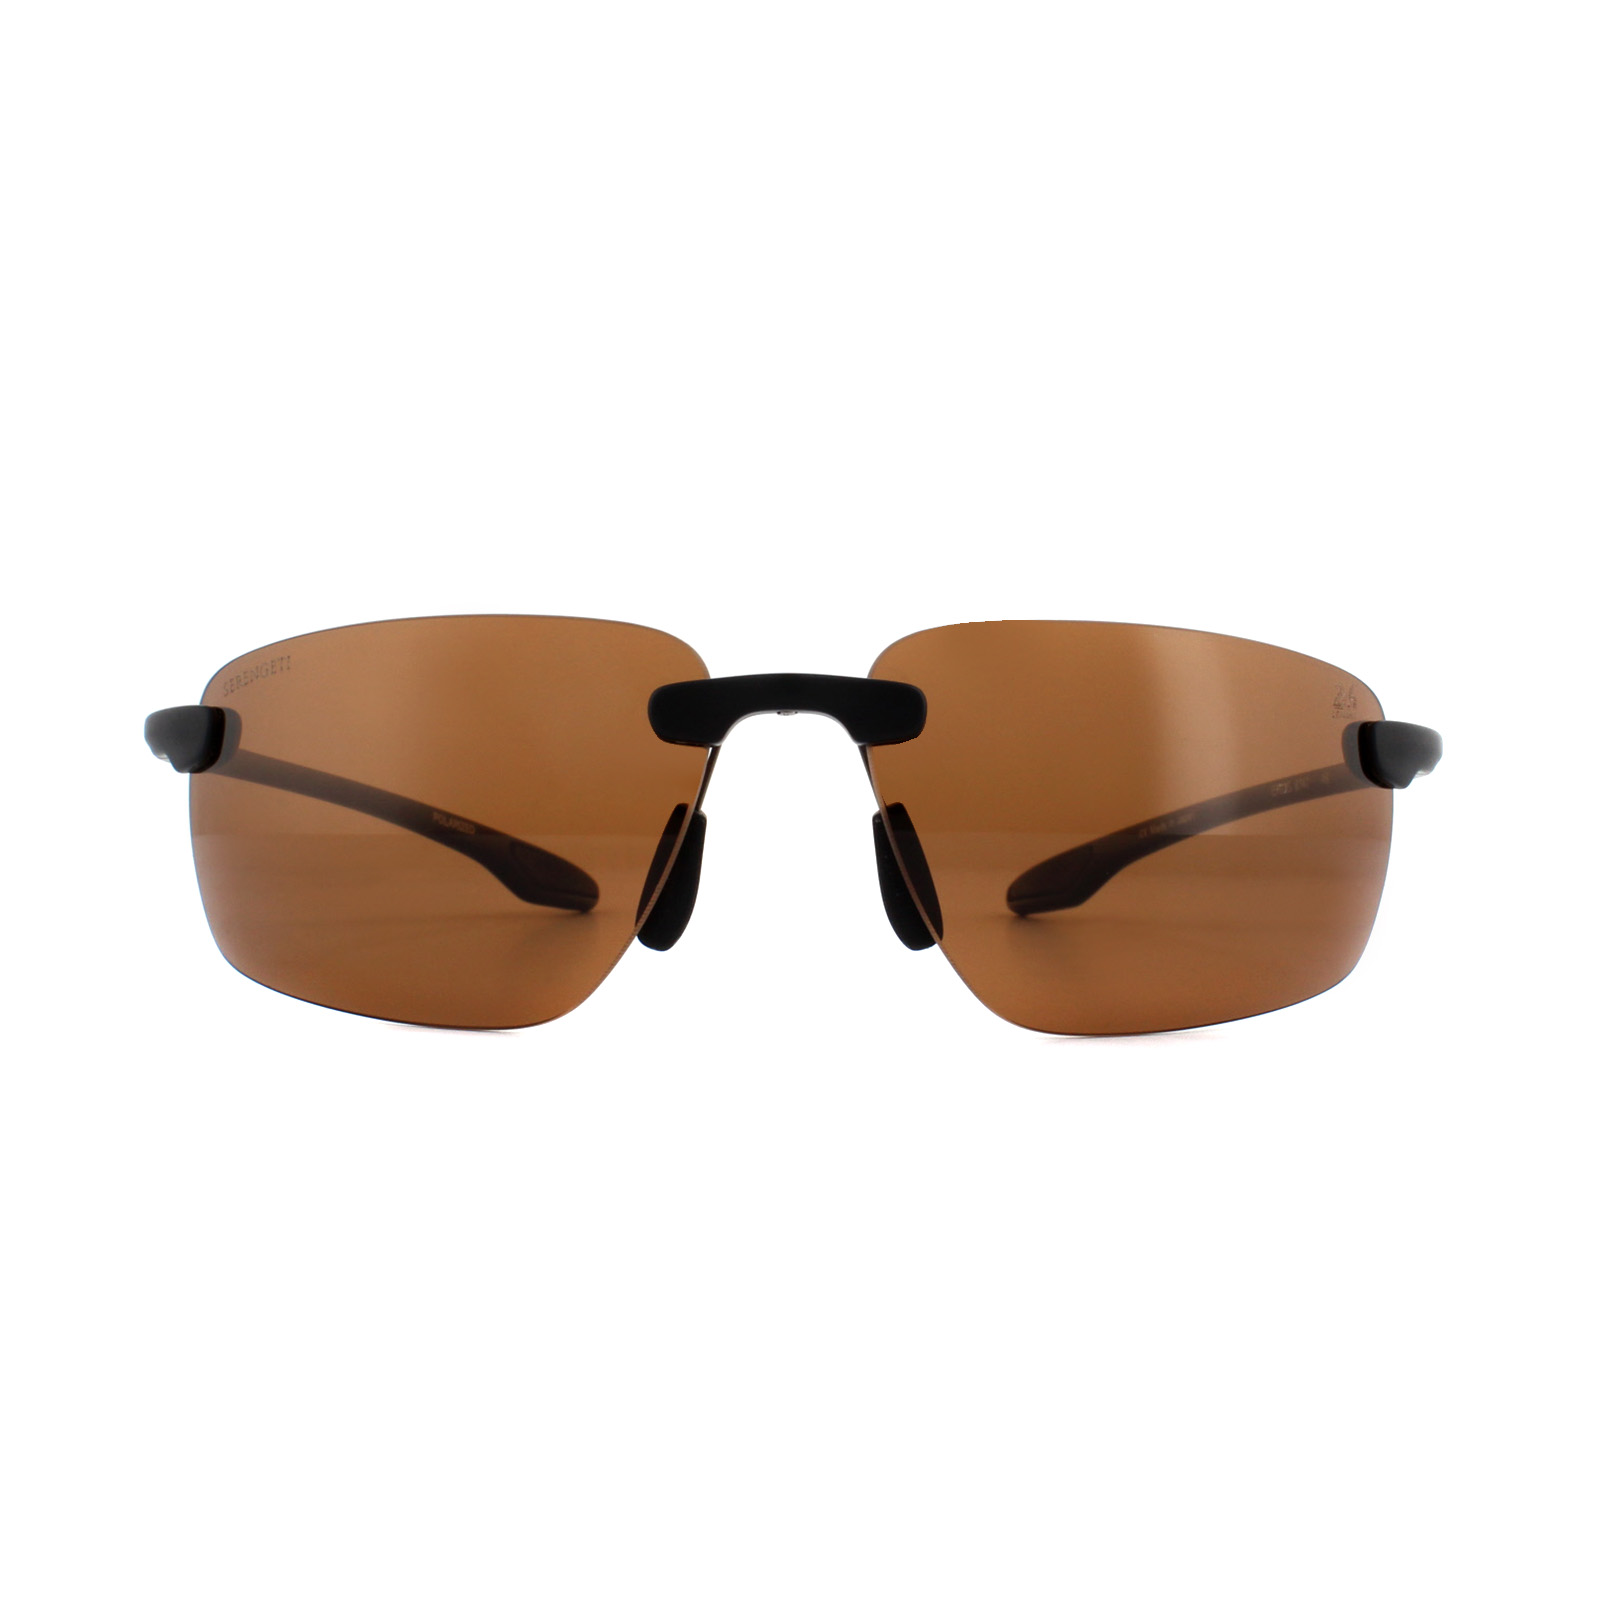 5c8c75970e Sentinel Serengeti Sunglasses Erice 8747 Satin Black Gold PhD Drivers Brown  Polarized